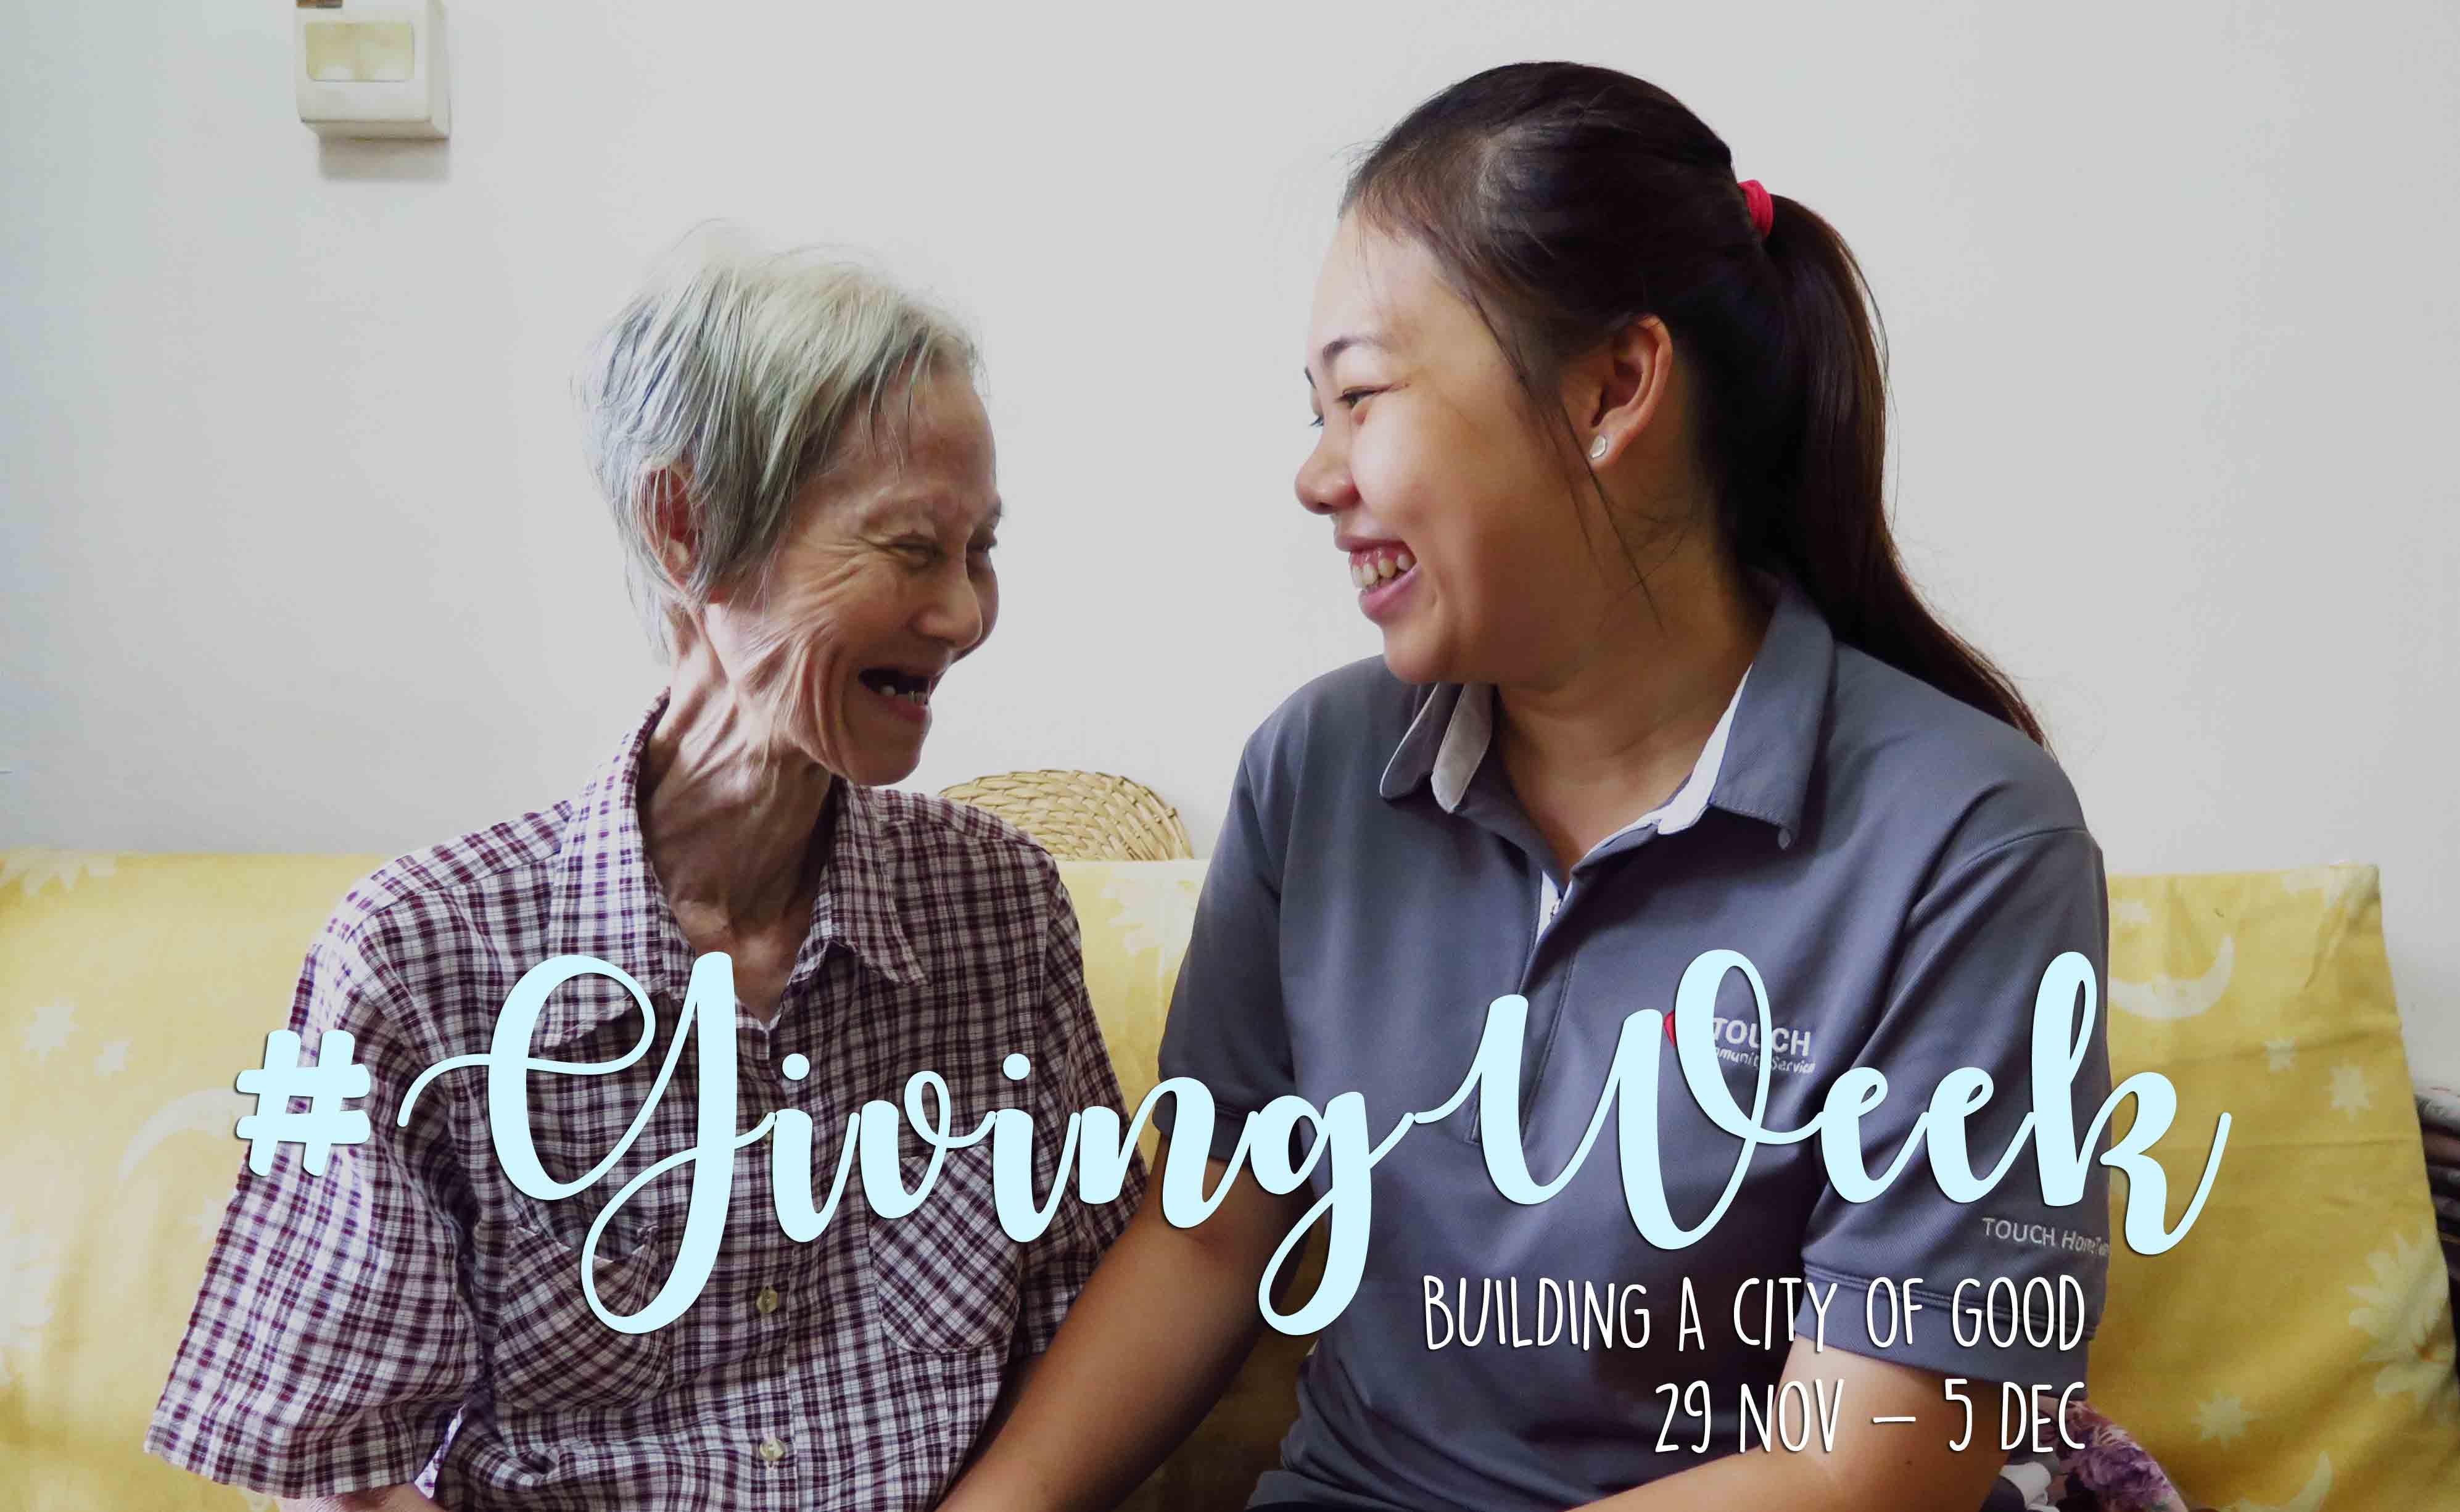 #GivingWeek: Make this a meaningful week!